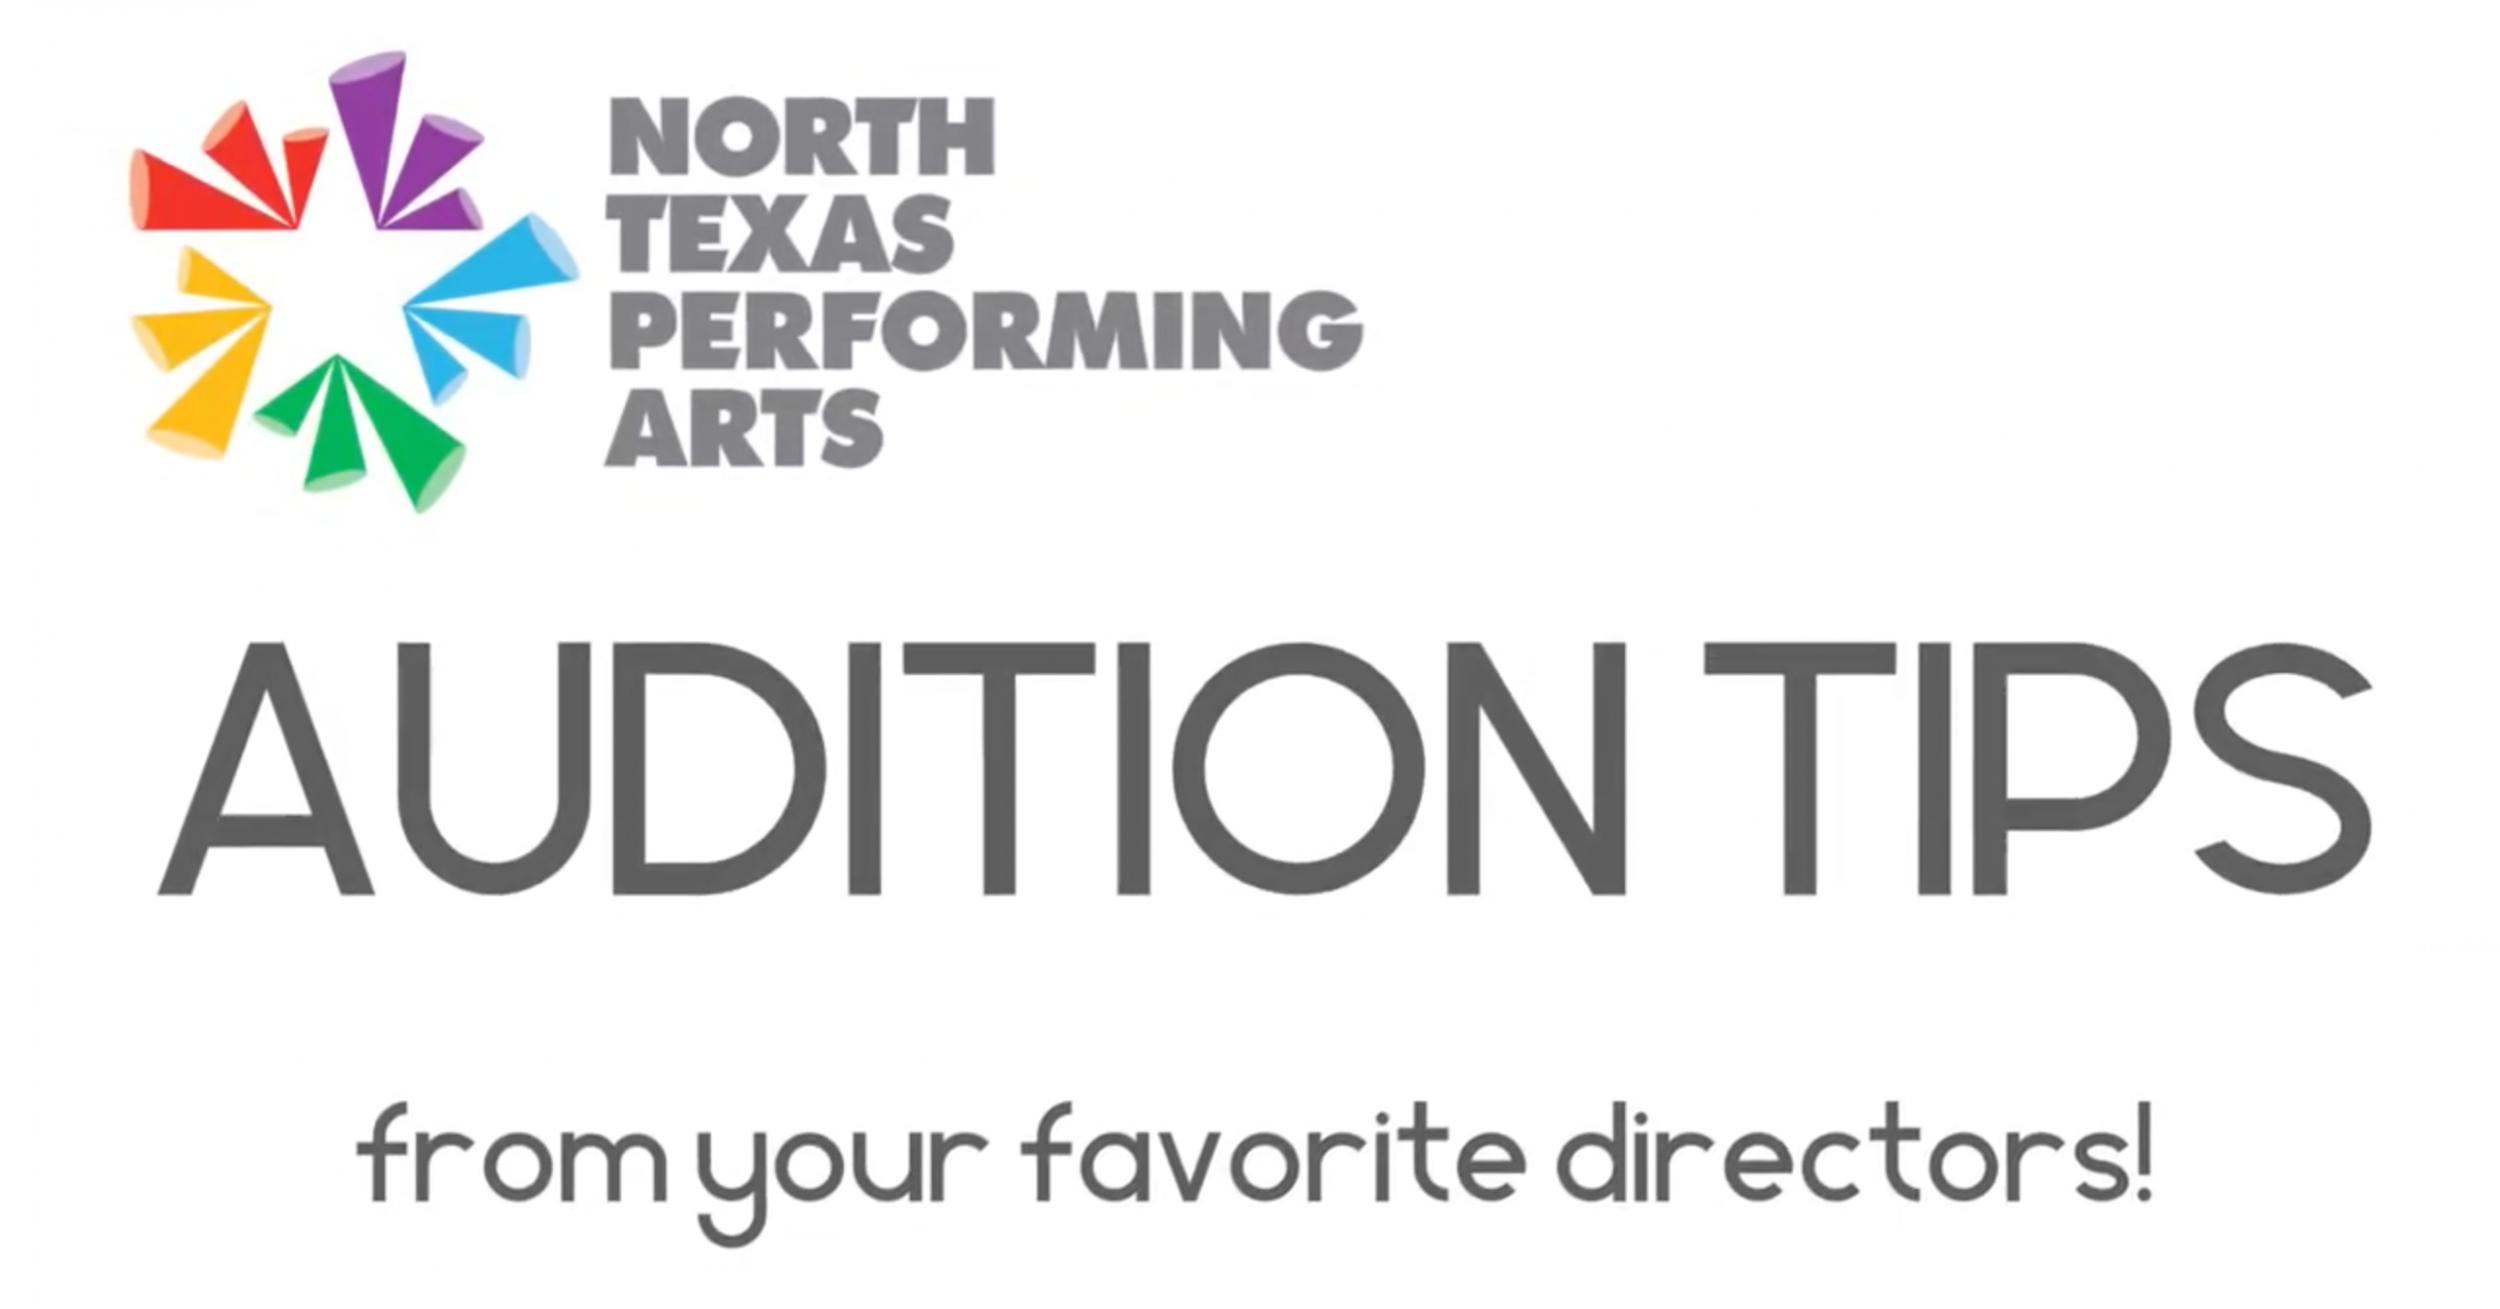 north texas performing arts logo audition tips